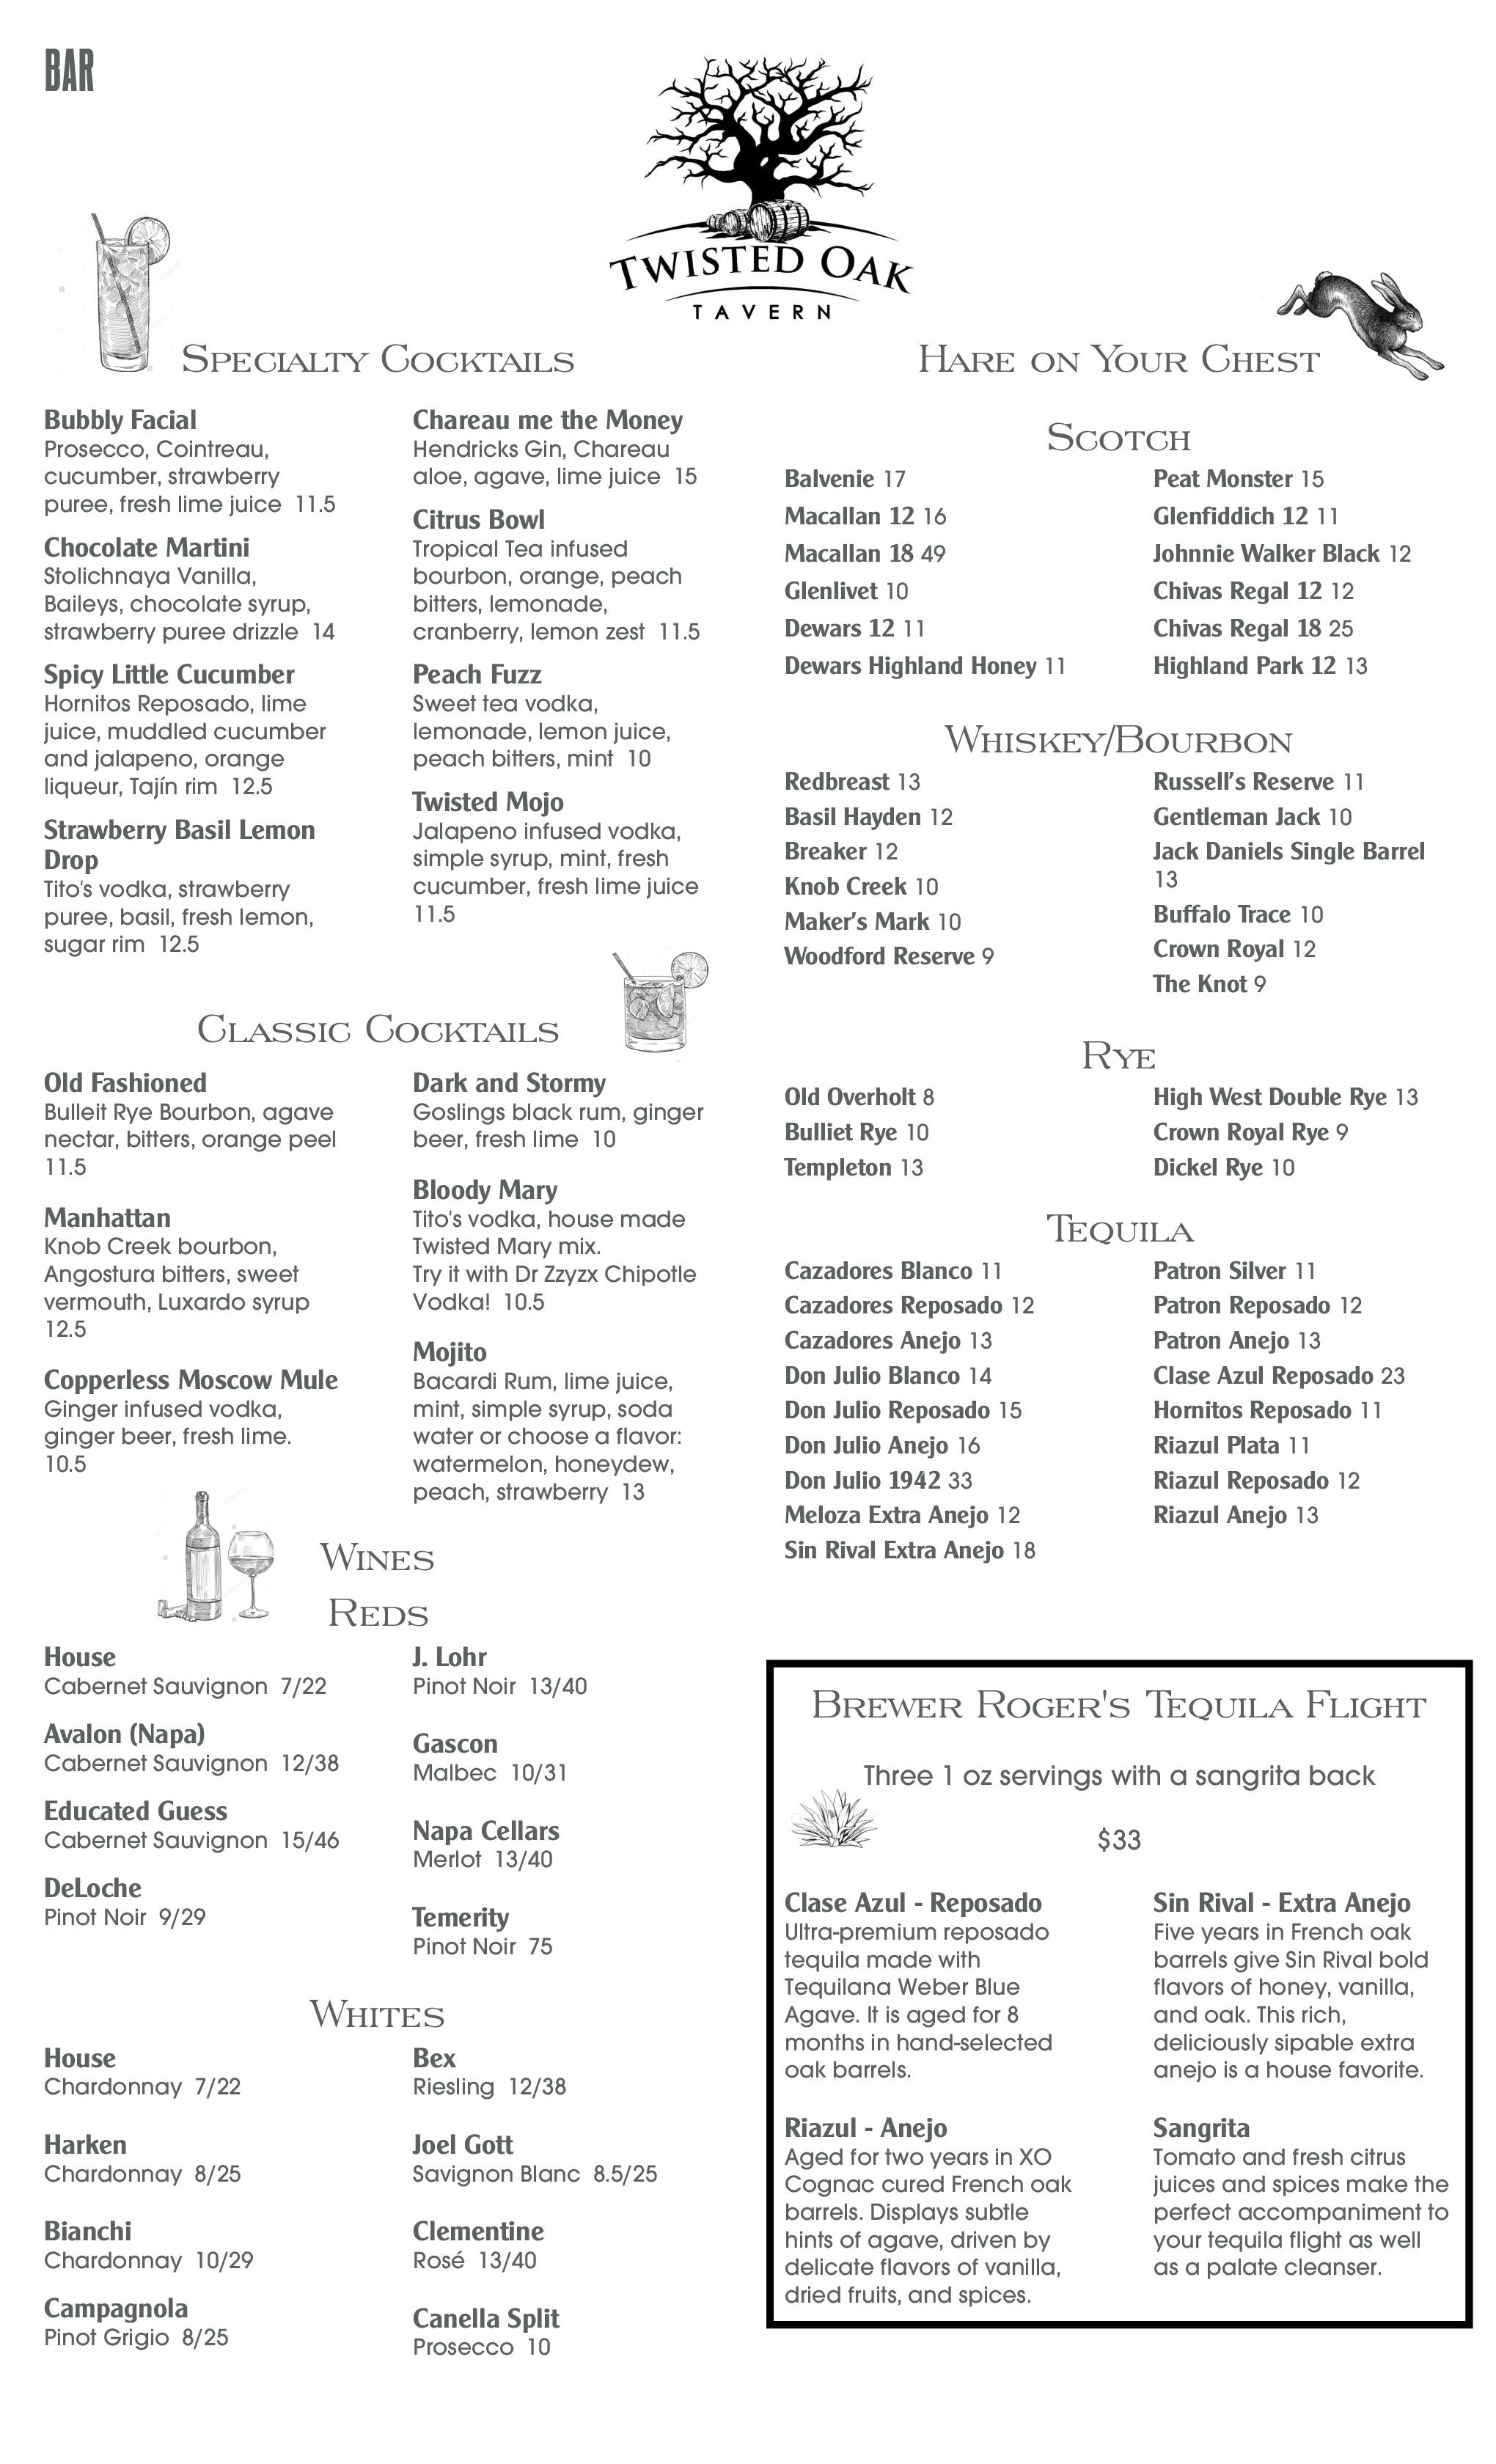 legal_drinks updated 3.6.19.jpg